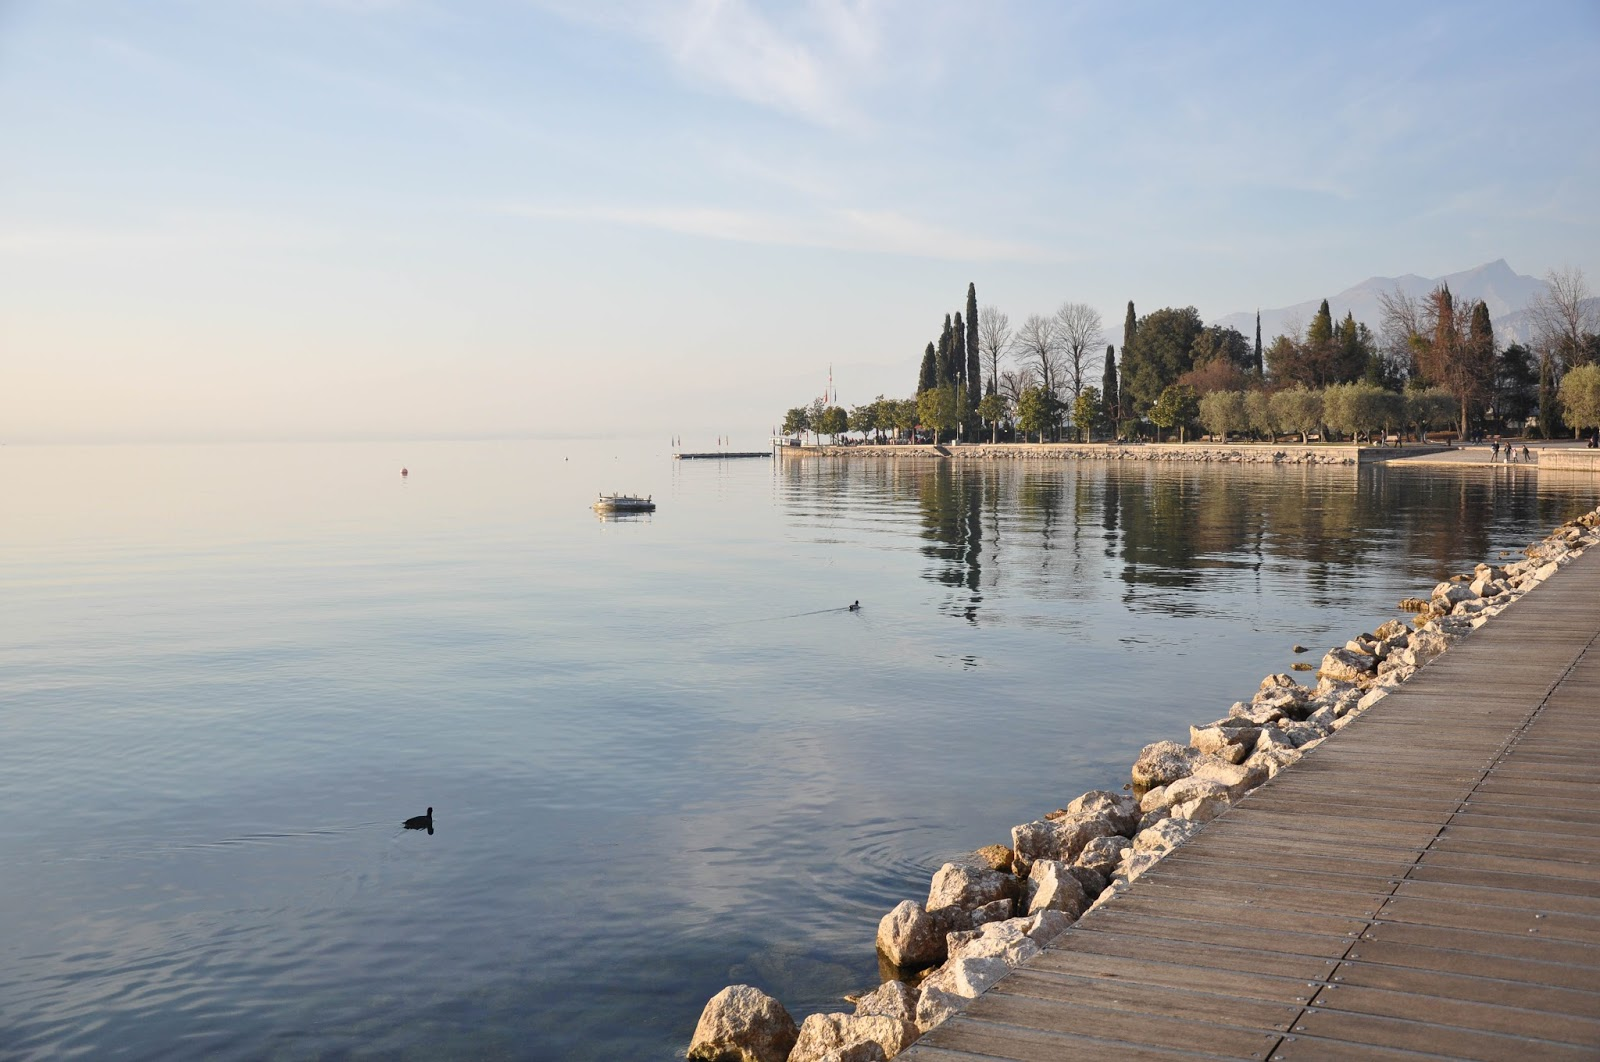 The promenade, Bardolino, Lake Garda, Italy